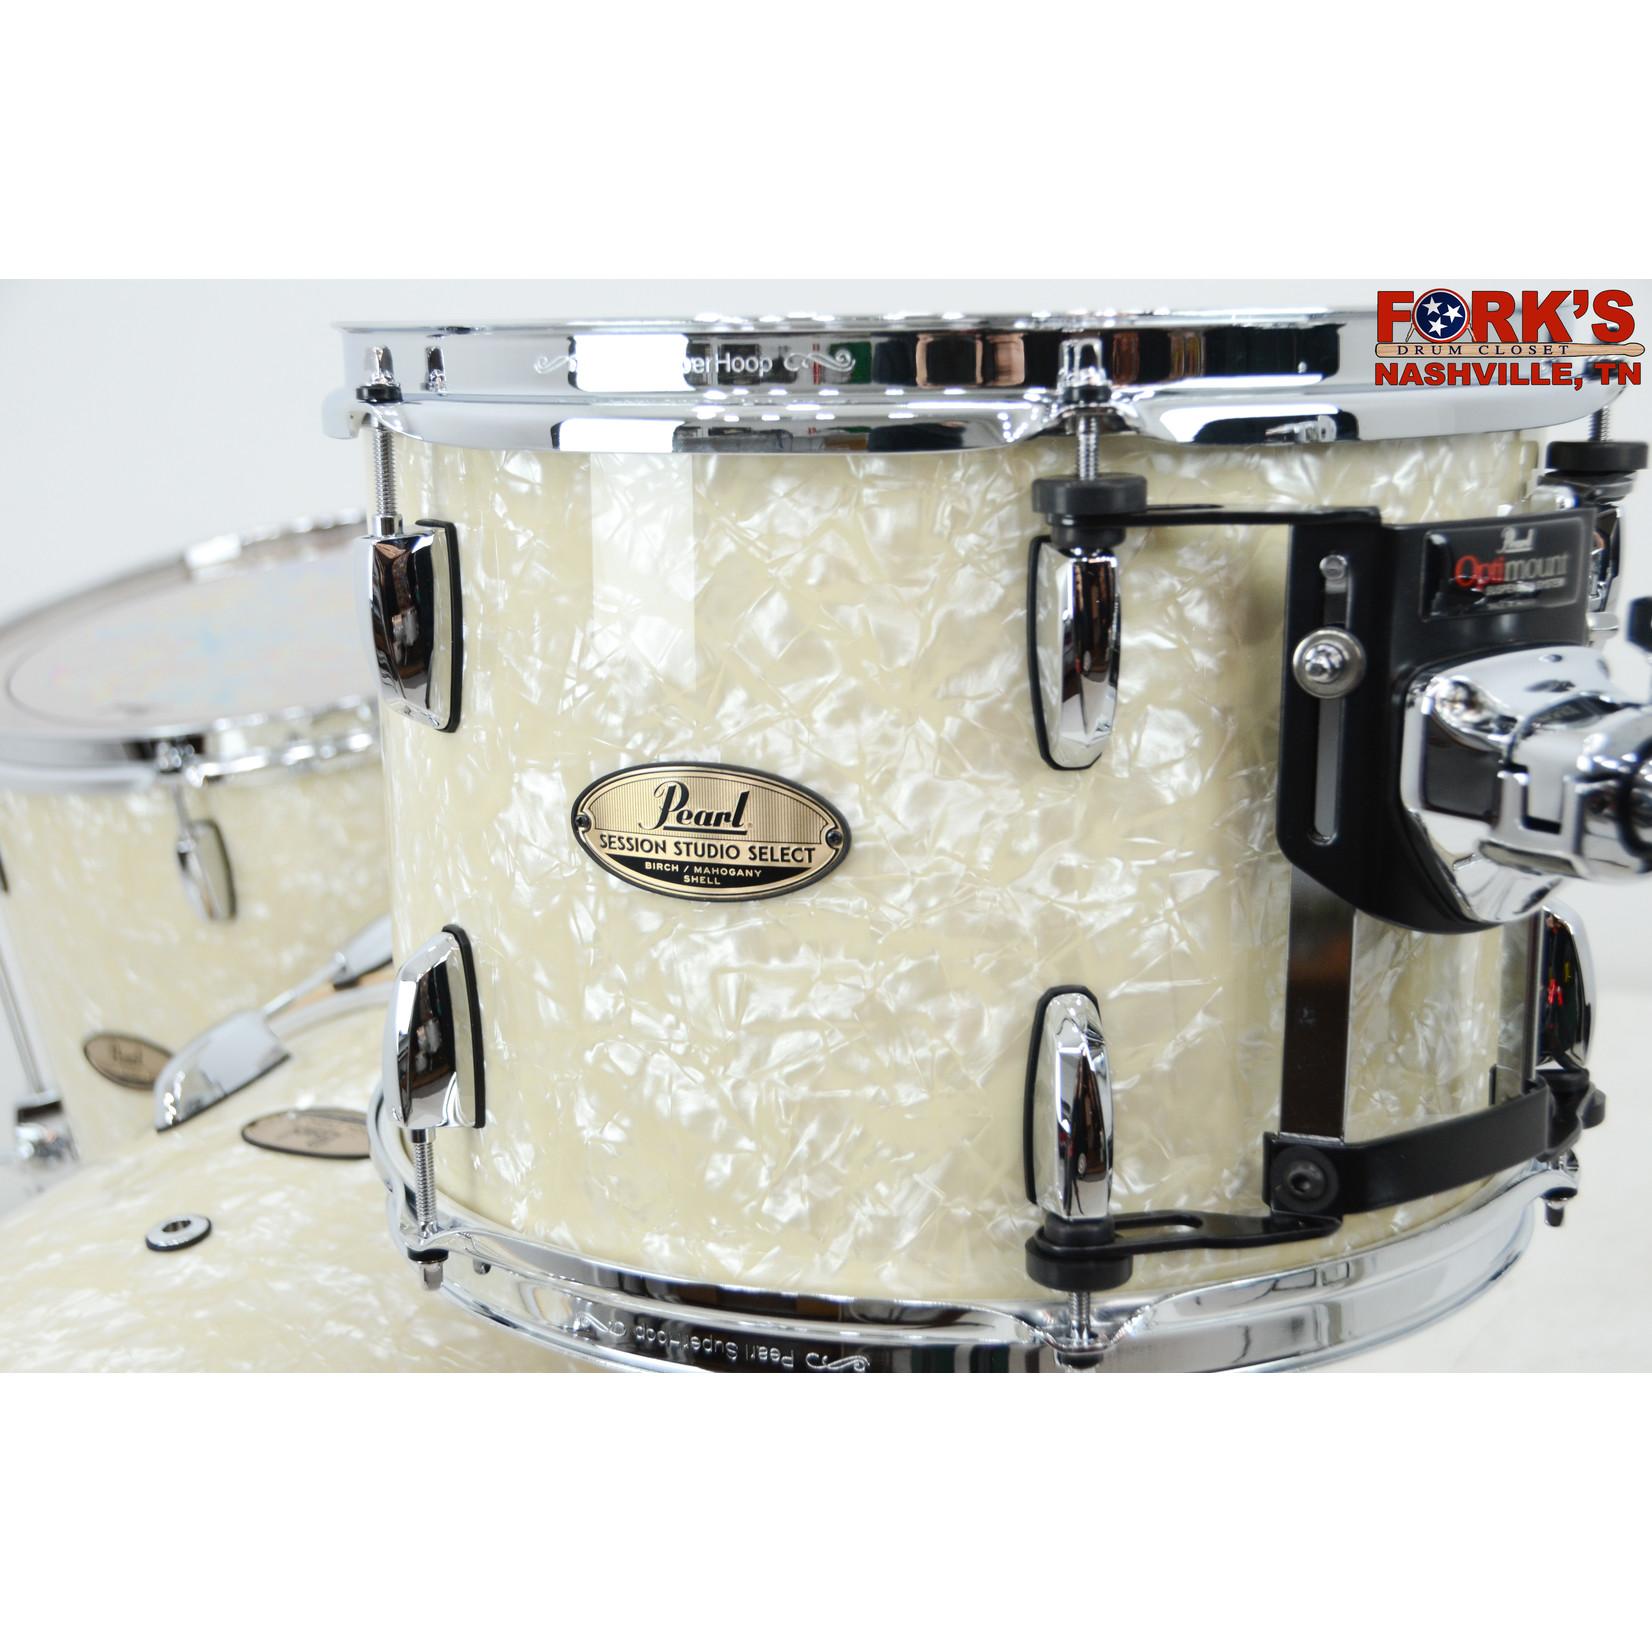 "Pearl Pearl Session Studio Select 3pc Drum Kit ""Nicotine Marine Pearl"""